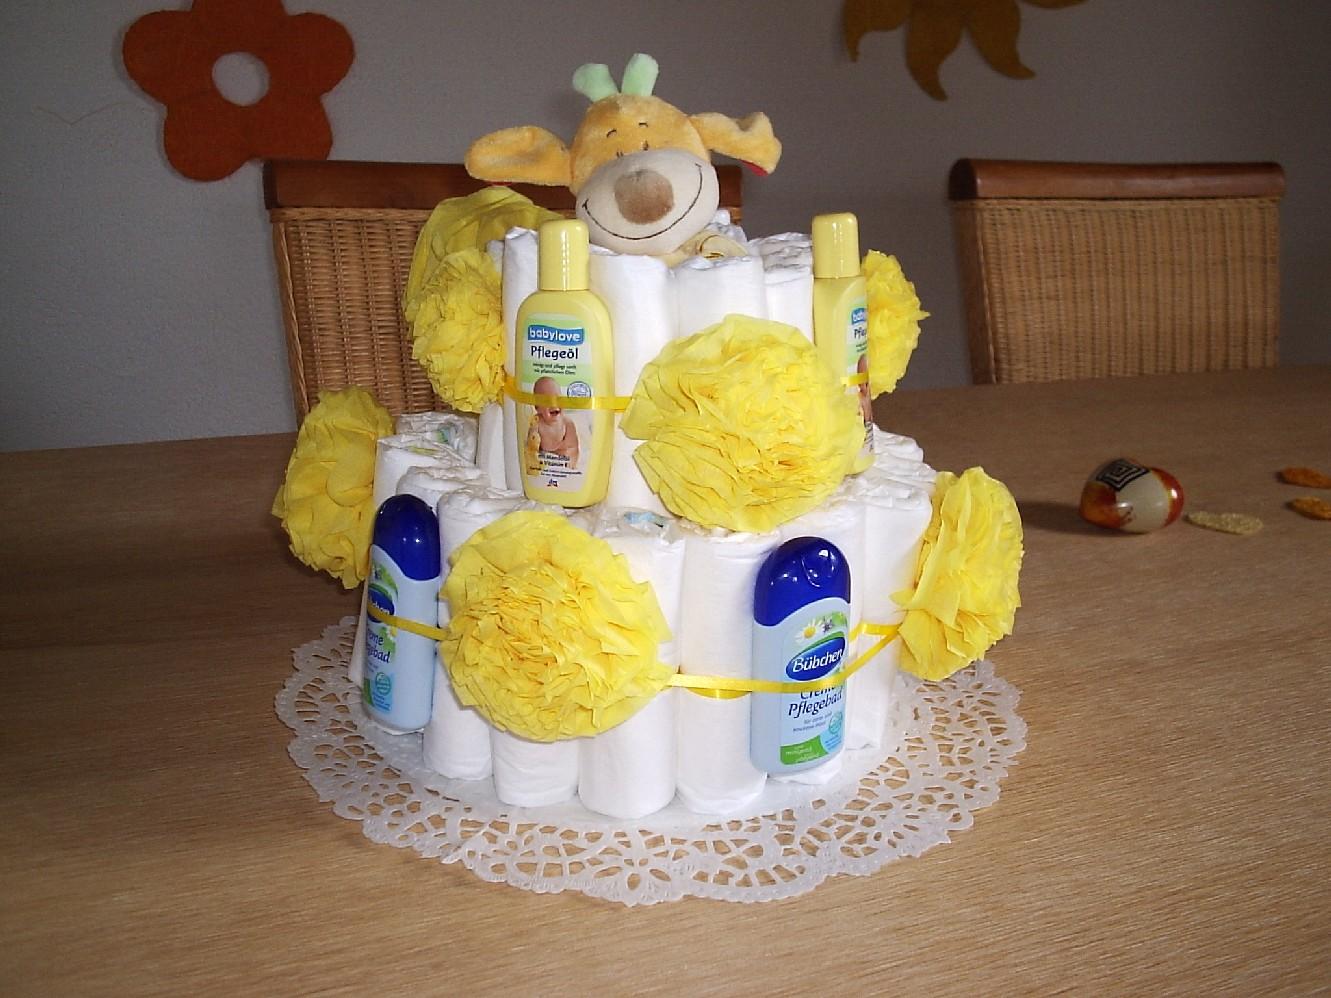 How To Make A Diaper Bathtub Cake